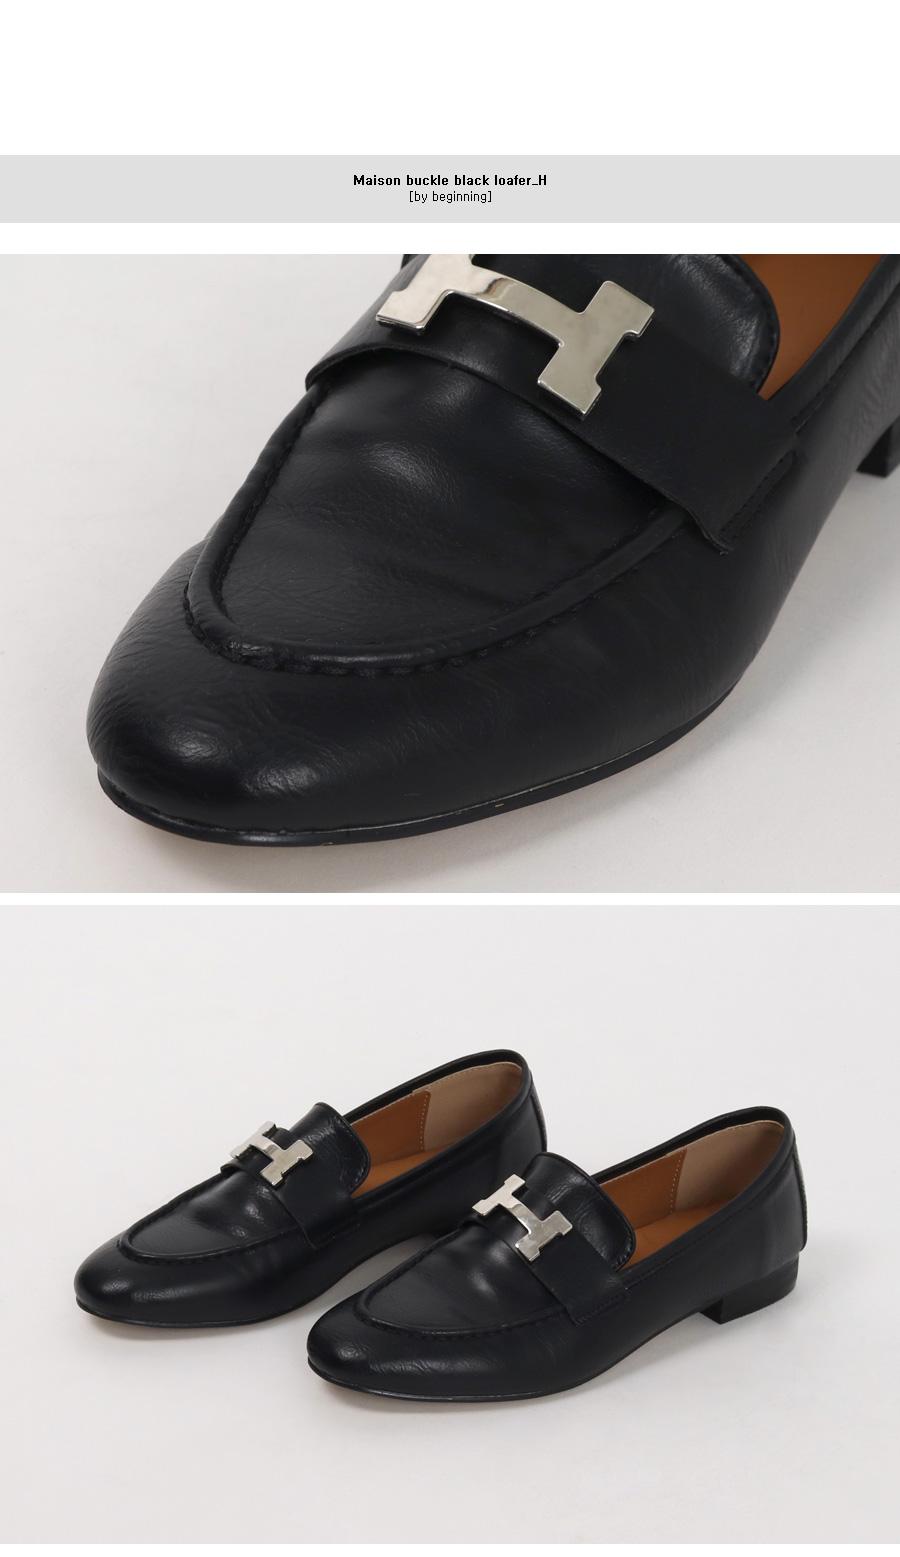 Maison buckle black loafer_H (size : 225,230,235,240,245,250)